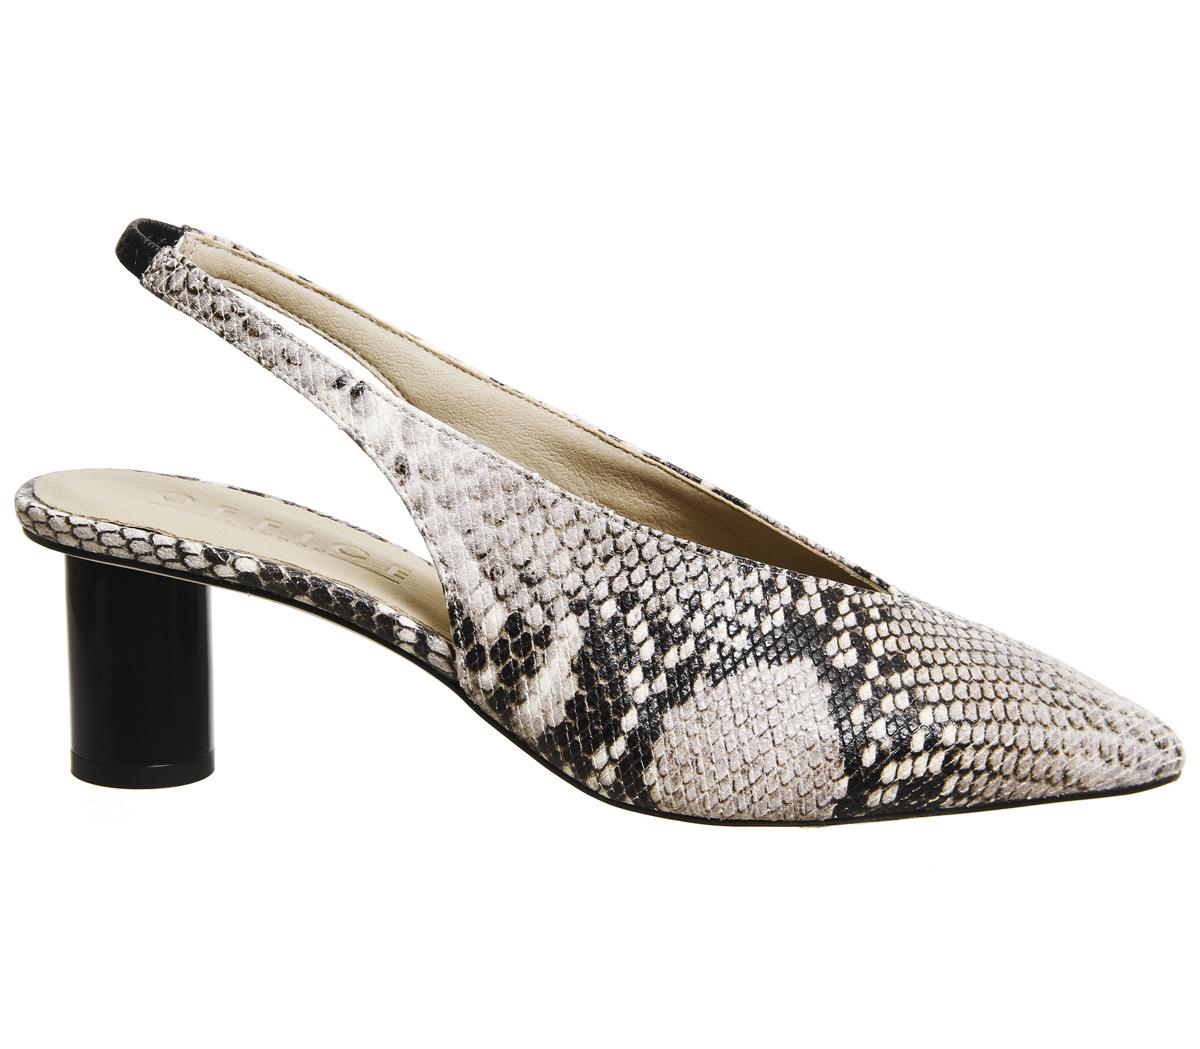 Damenschuhe SNAKE Office Mischief Pointed Heels NATURAL SNAKE Damenschuhe BLACK SPRAY HEEL Heels c7adc6